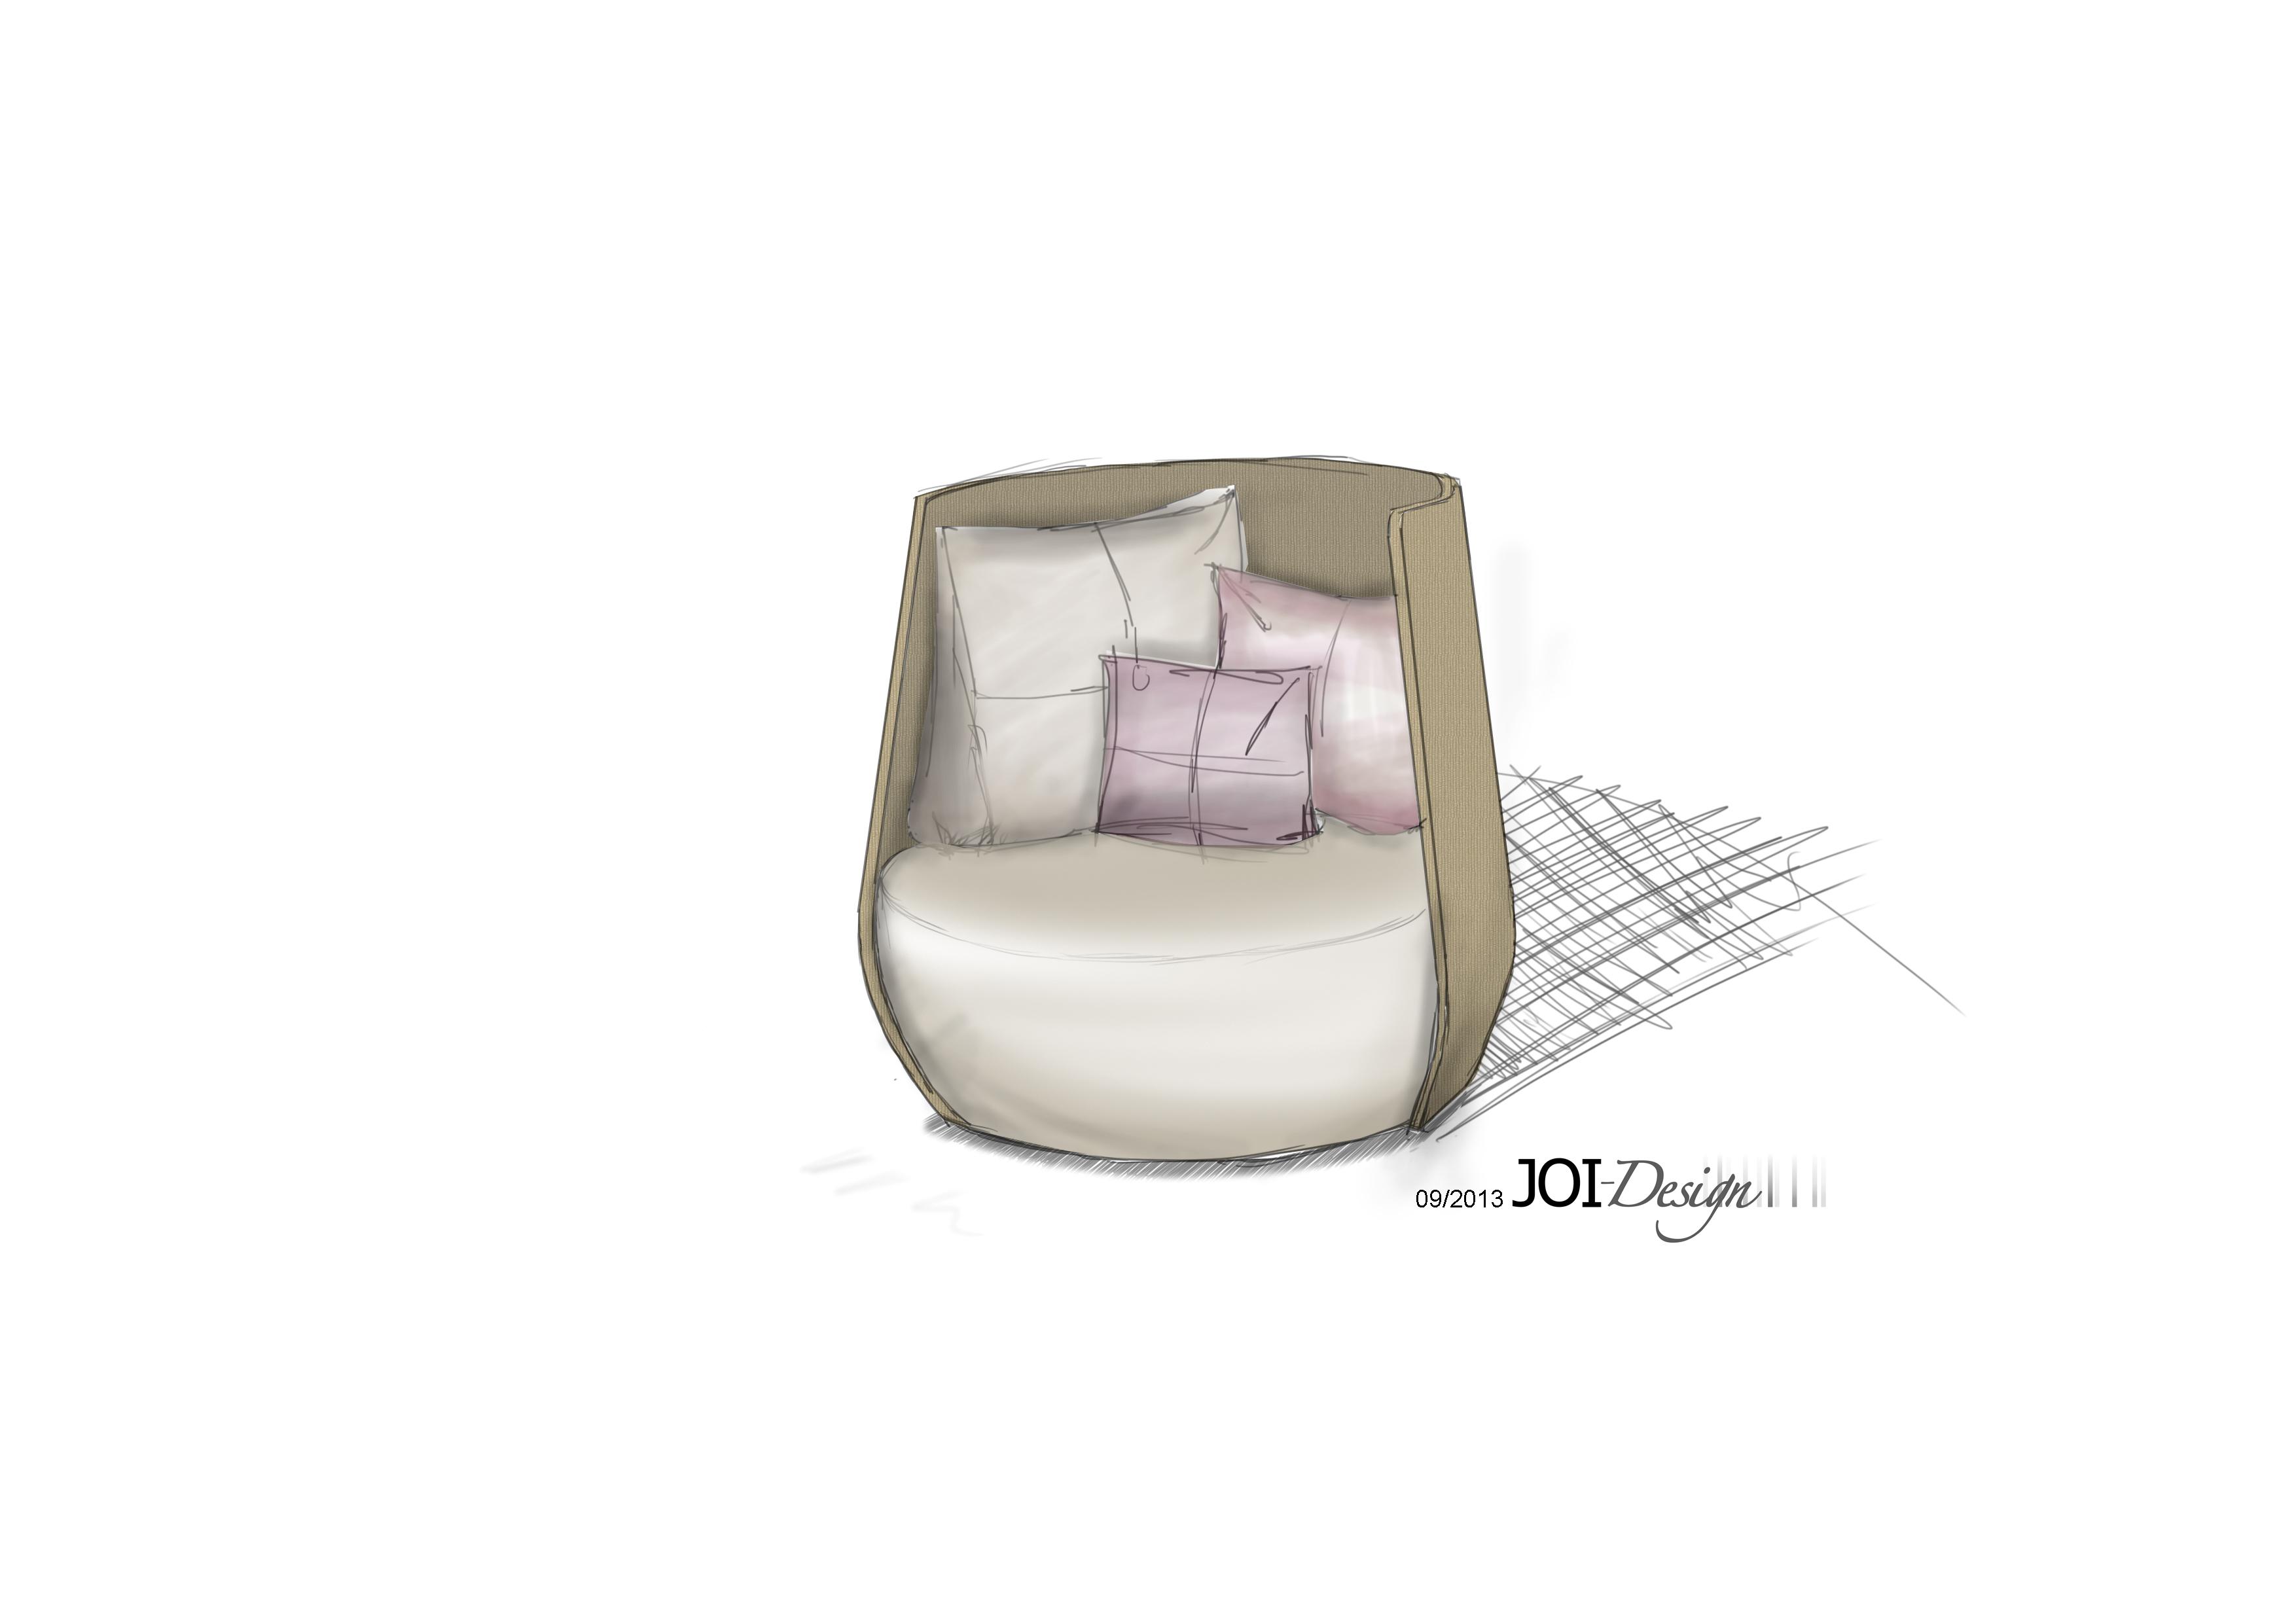 Skizze JOI Design MMV Lounge Objekt